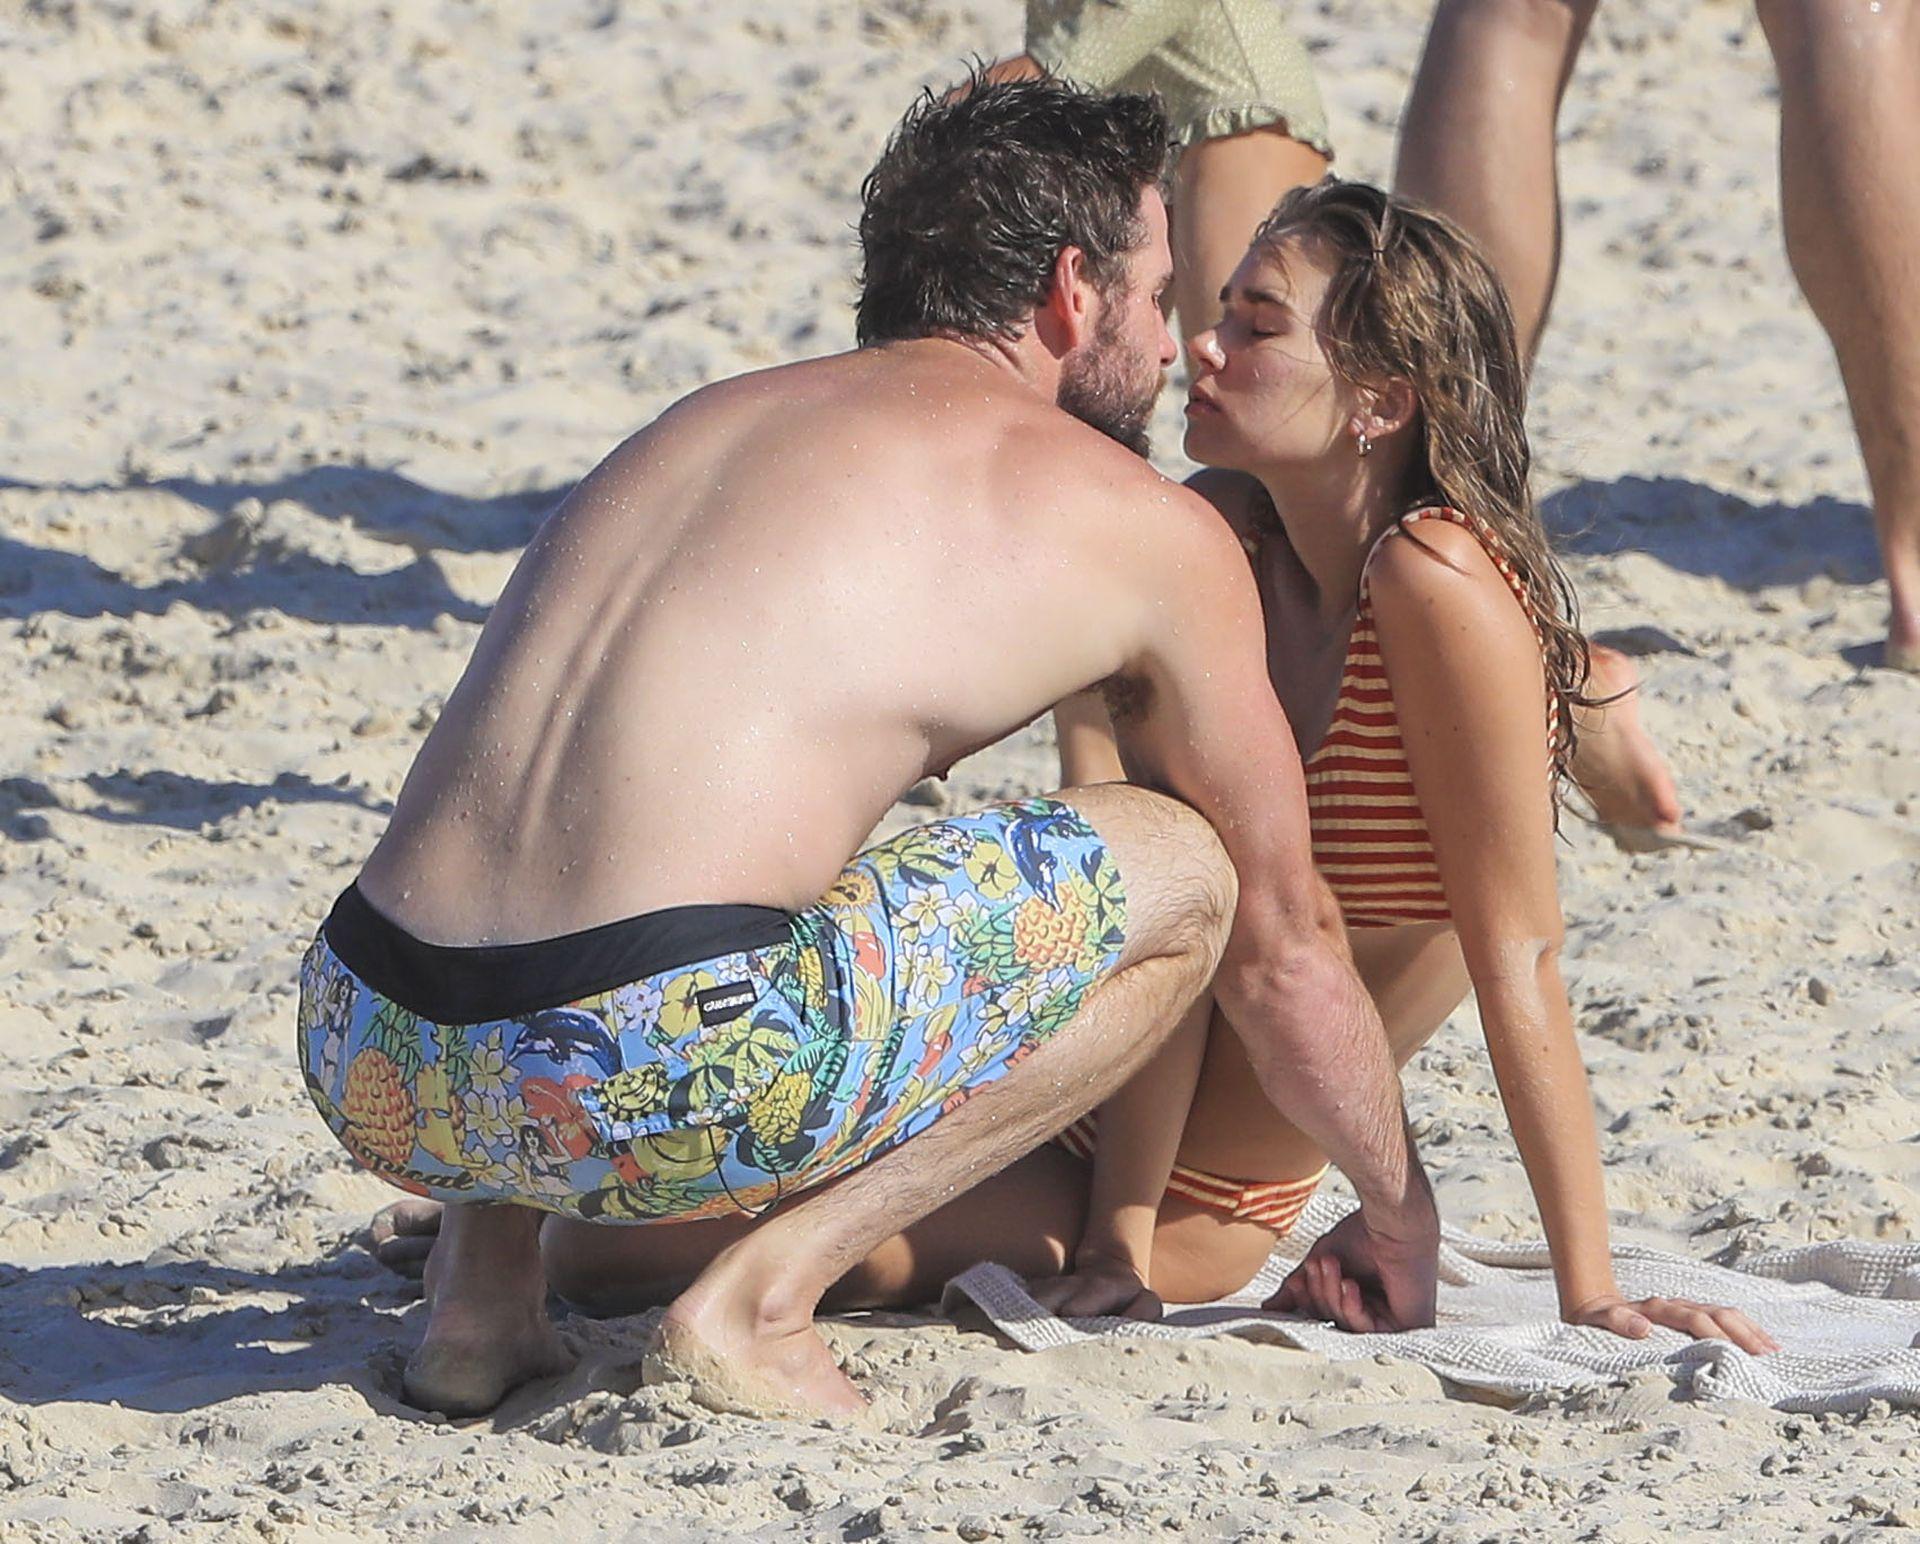 Gabriella Brooks Hot – Liam Hemsworth's New Girlfriend 0010